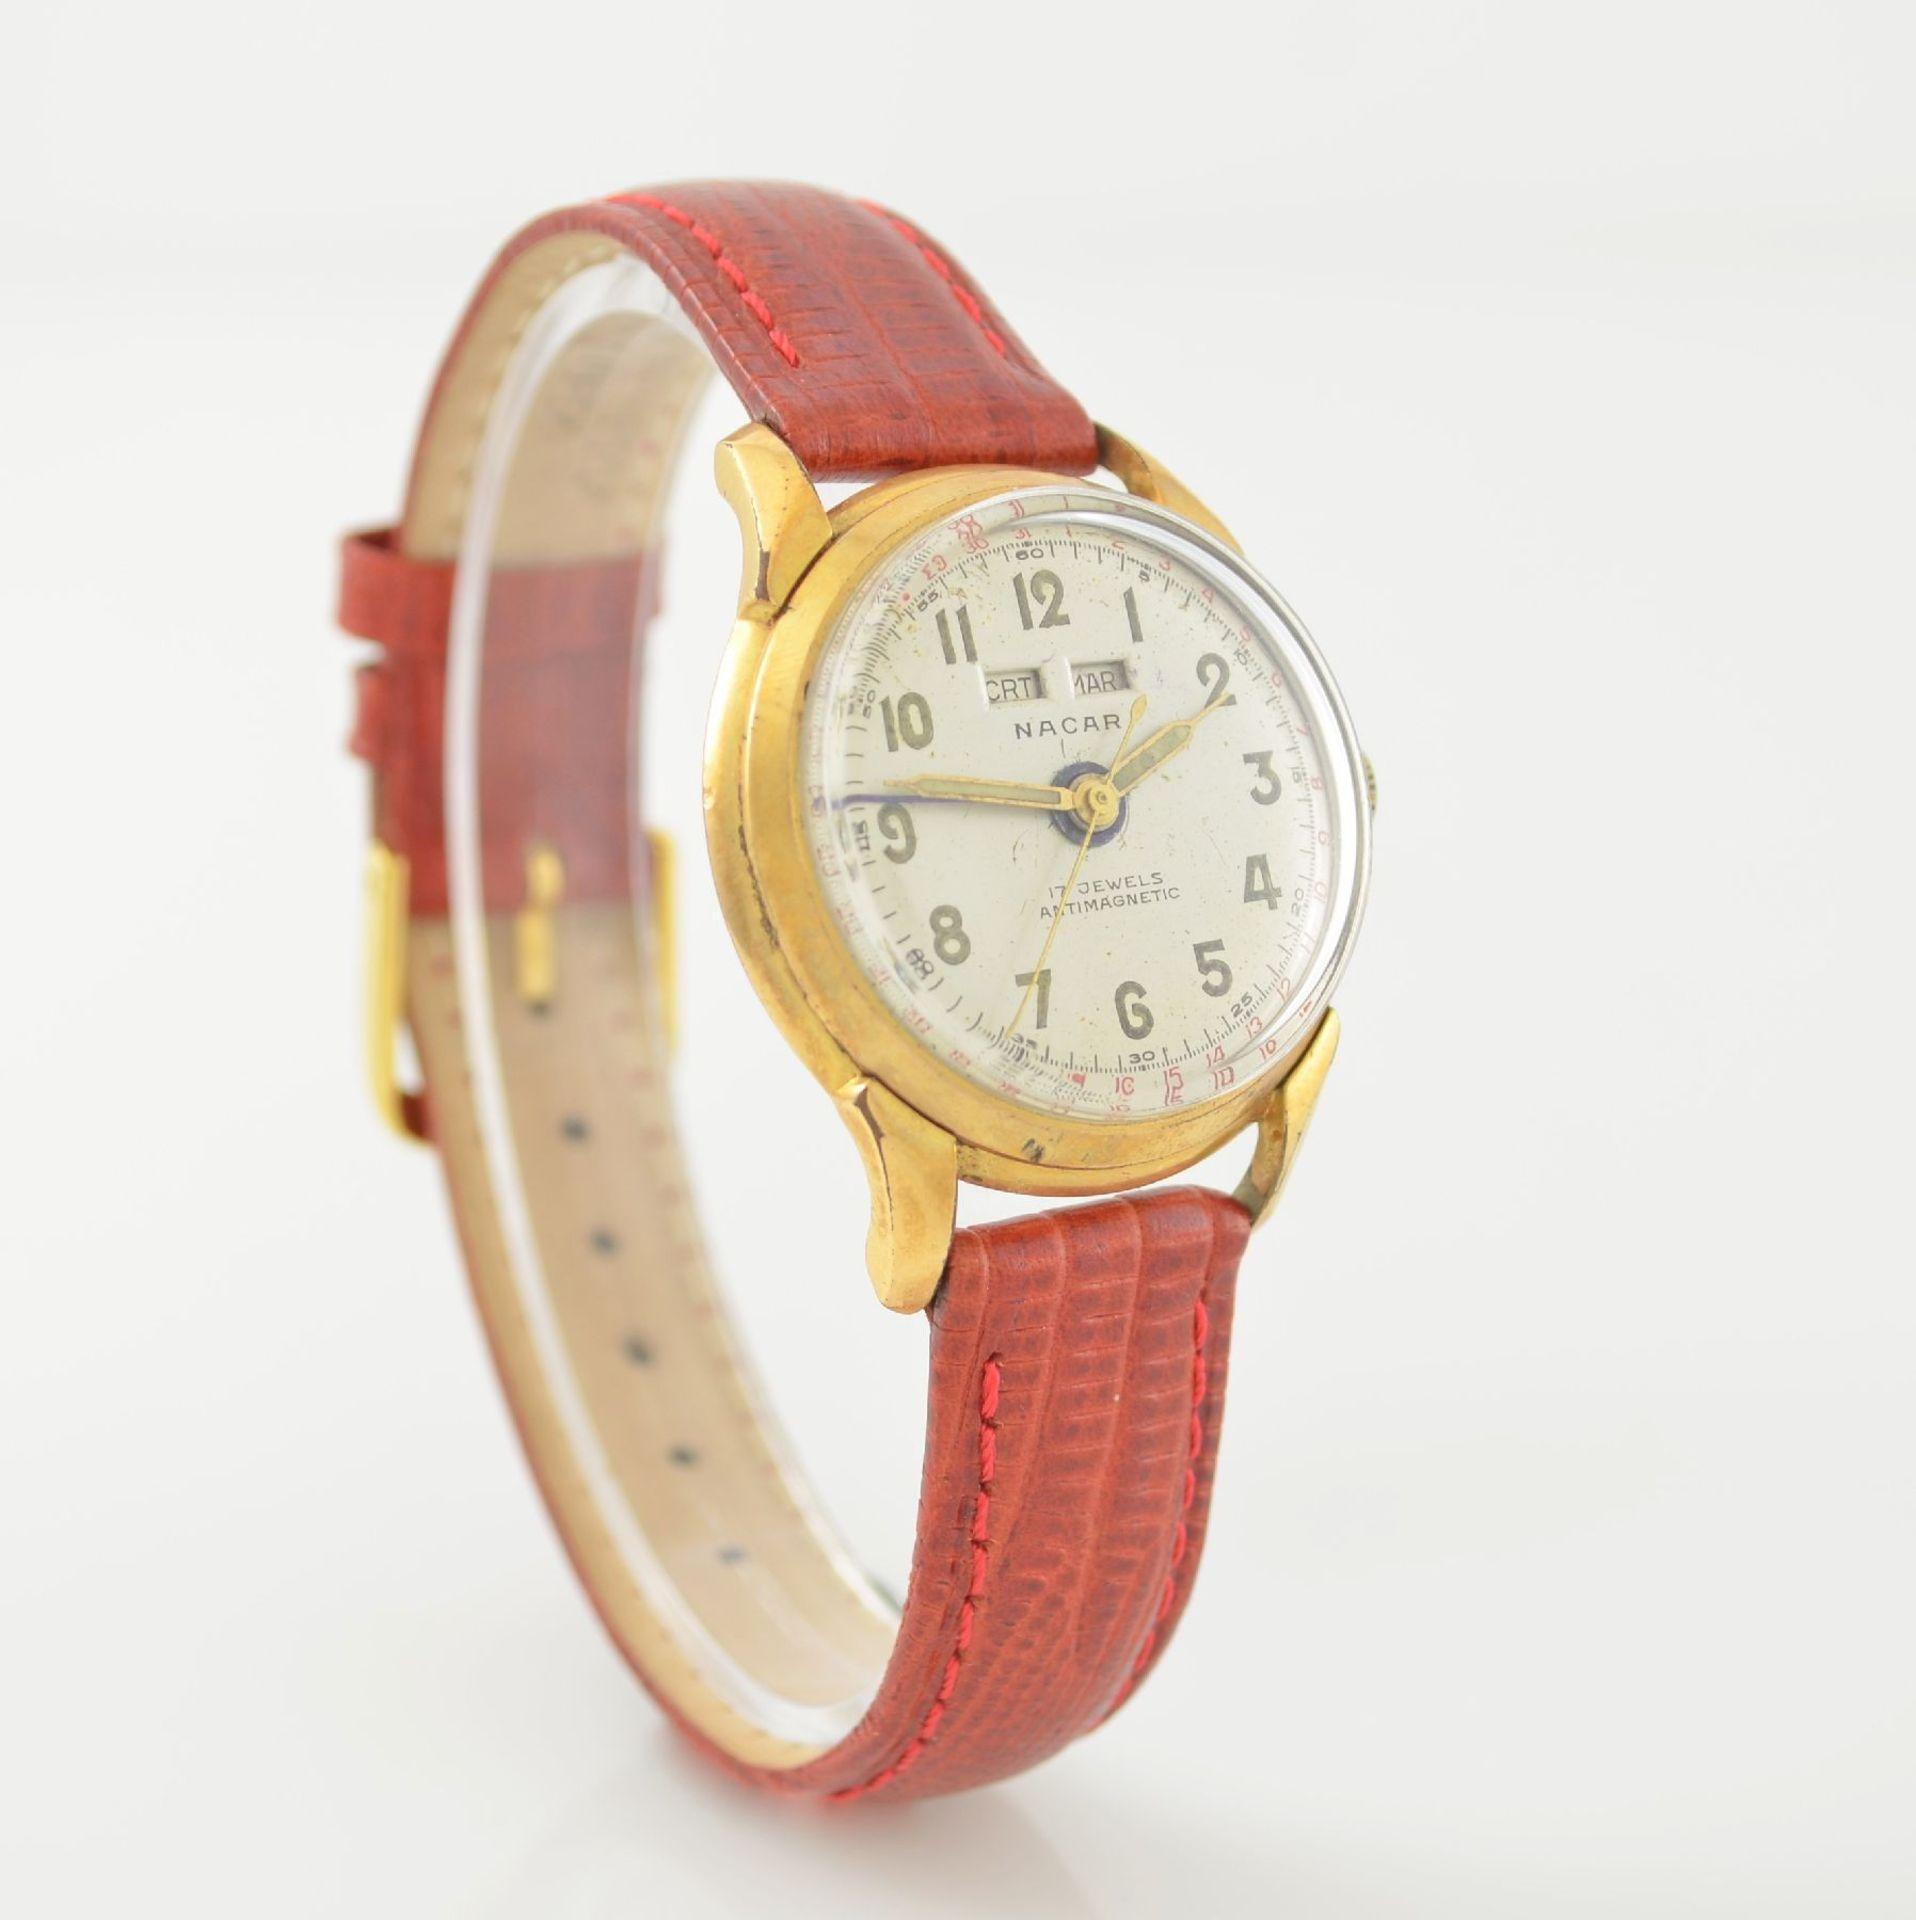 Konvolut: 2 Armbanduhren mit Kalender bzw. Datum, Schweiz um 1950-1960, Handaufzug, 1) NACAR m. - Bild 4 aus 12